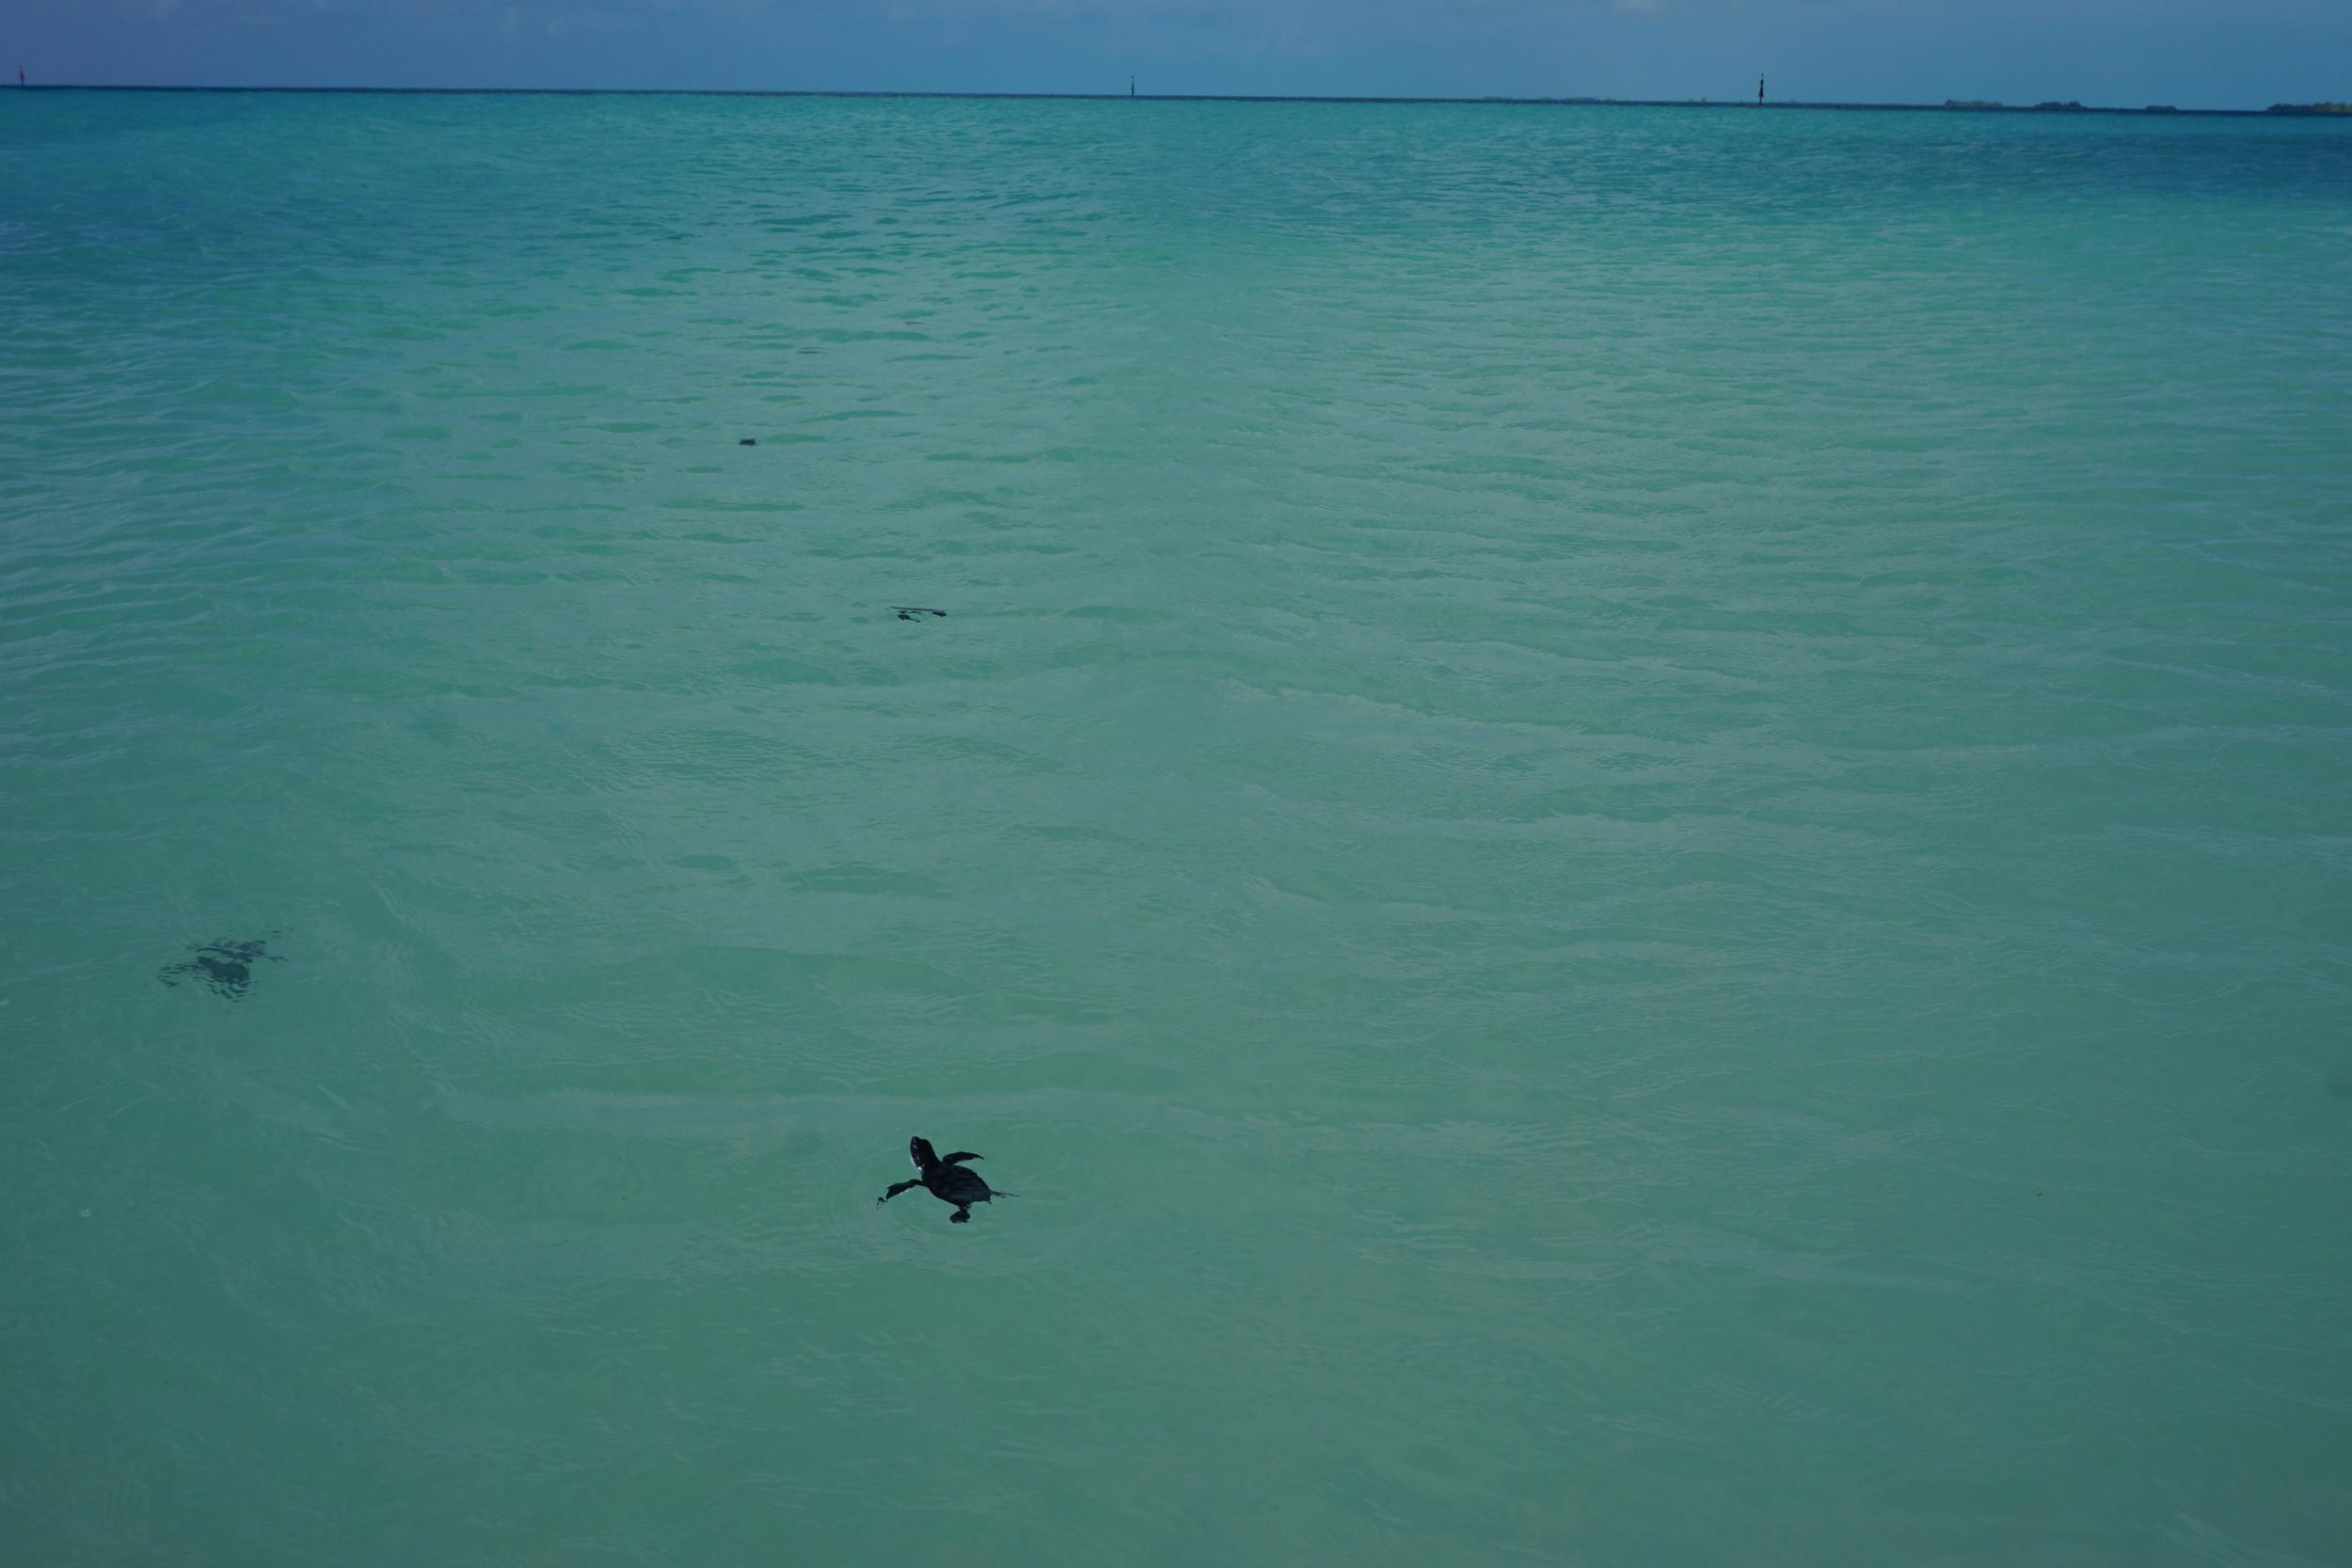 Baby sea turtles head for the open ocean. Photo by Daniel Ward.